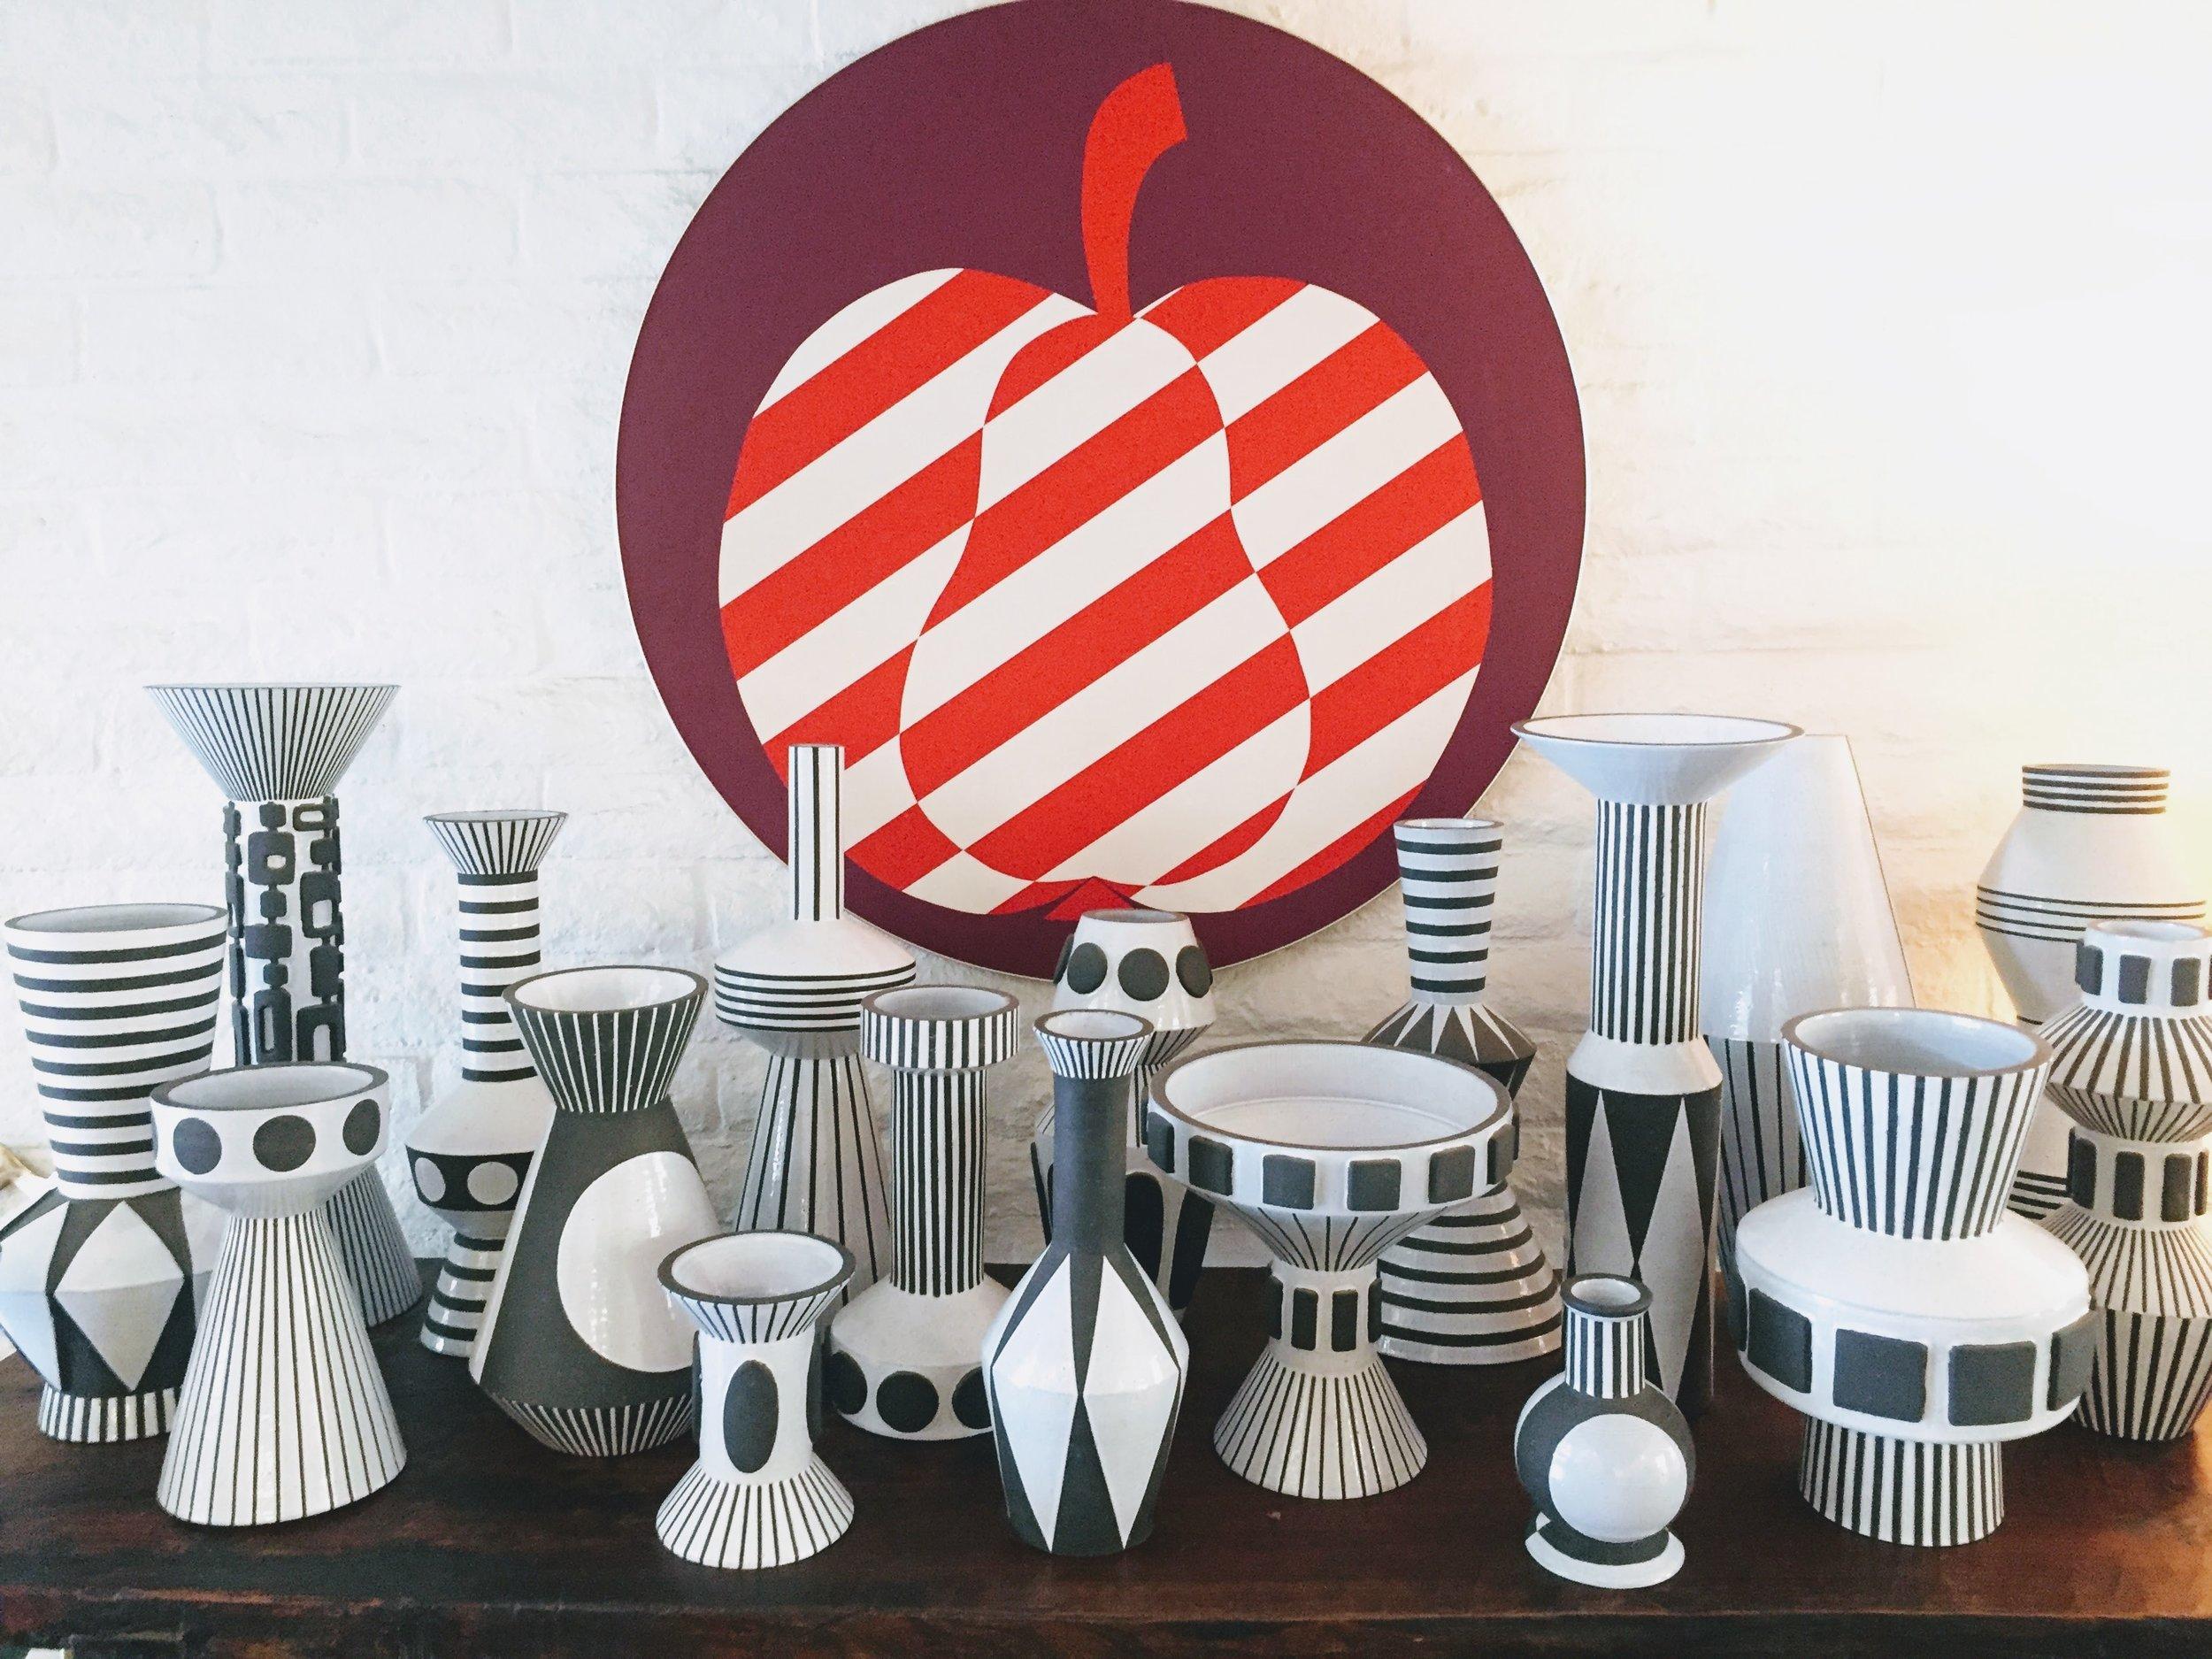 Jonathan Adler ceramics on display at The Parker